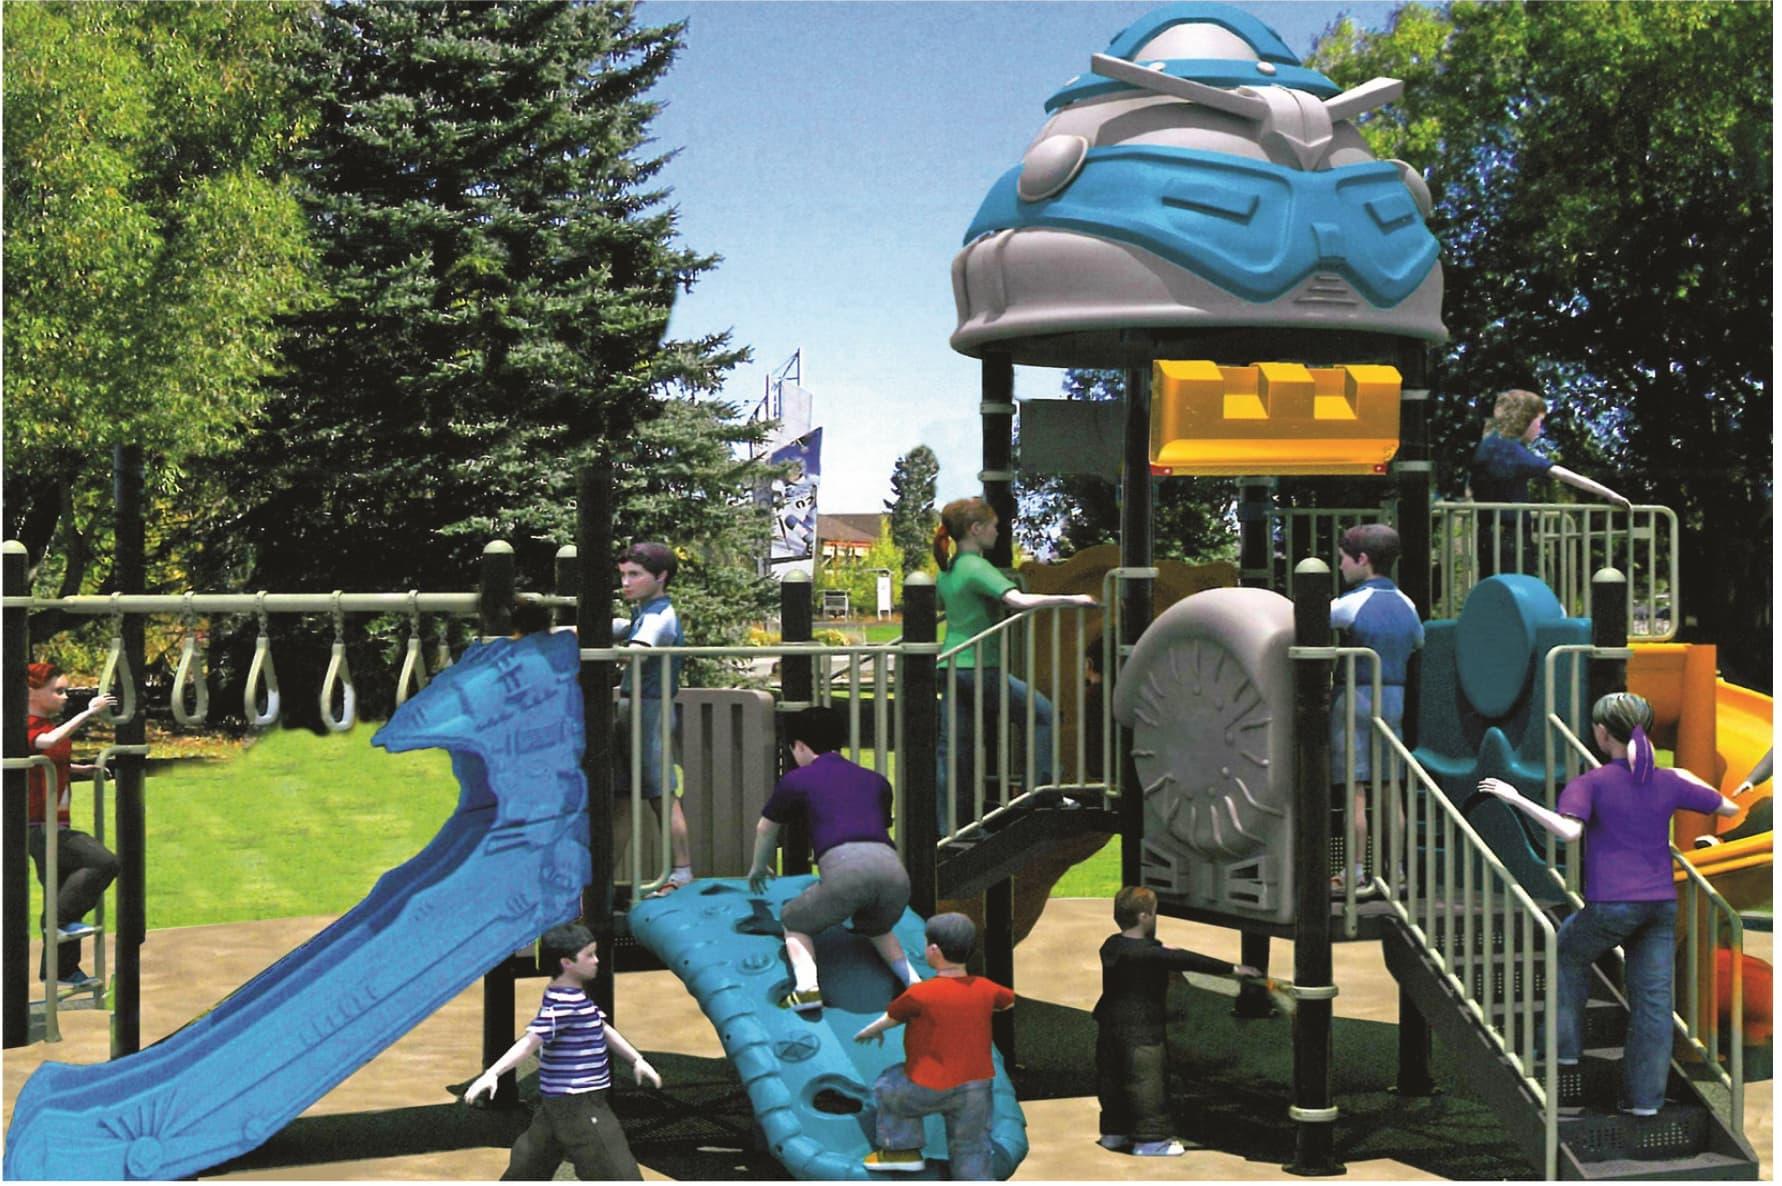 На картинке детский комплекс из каталога сайта Dgorodki.ru